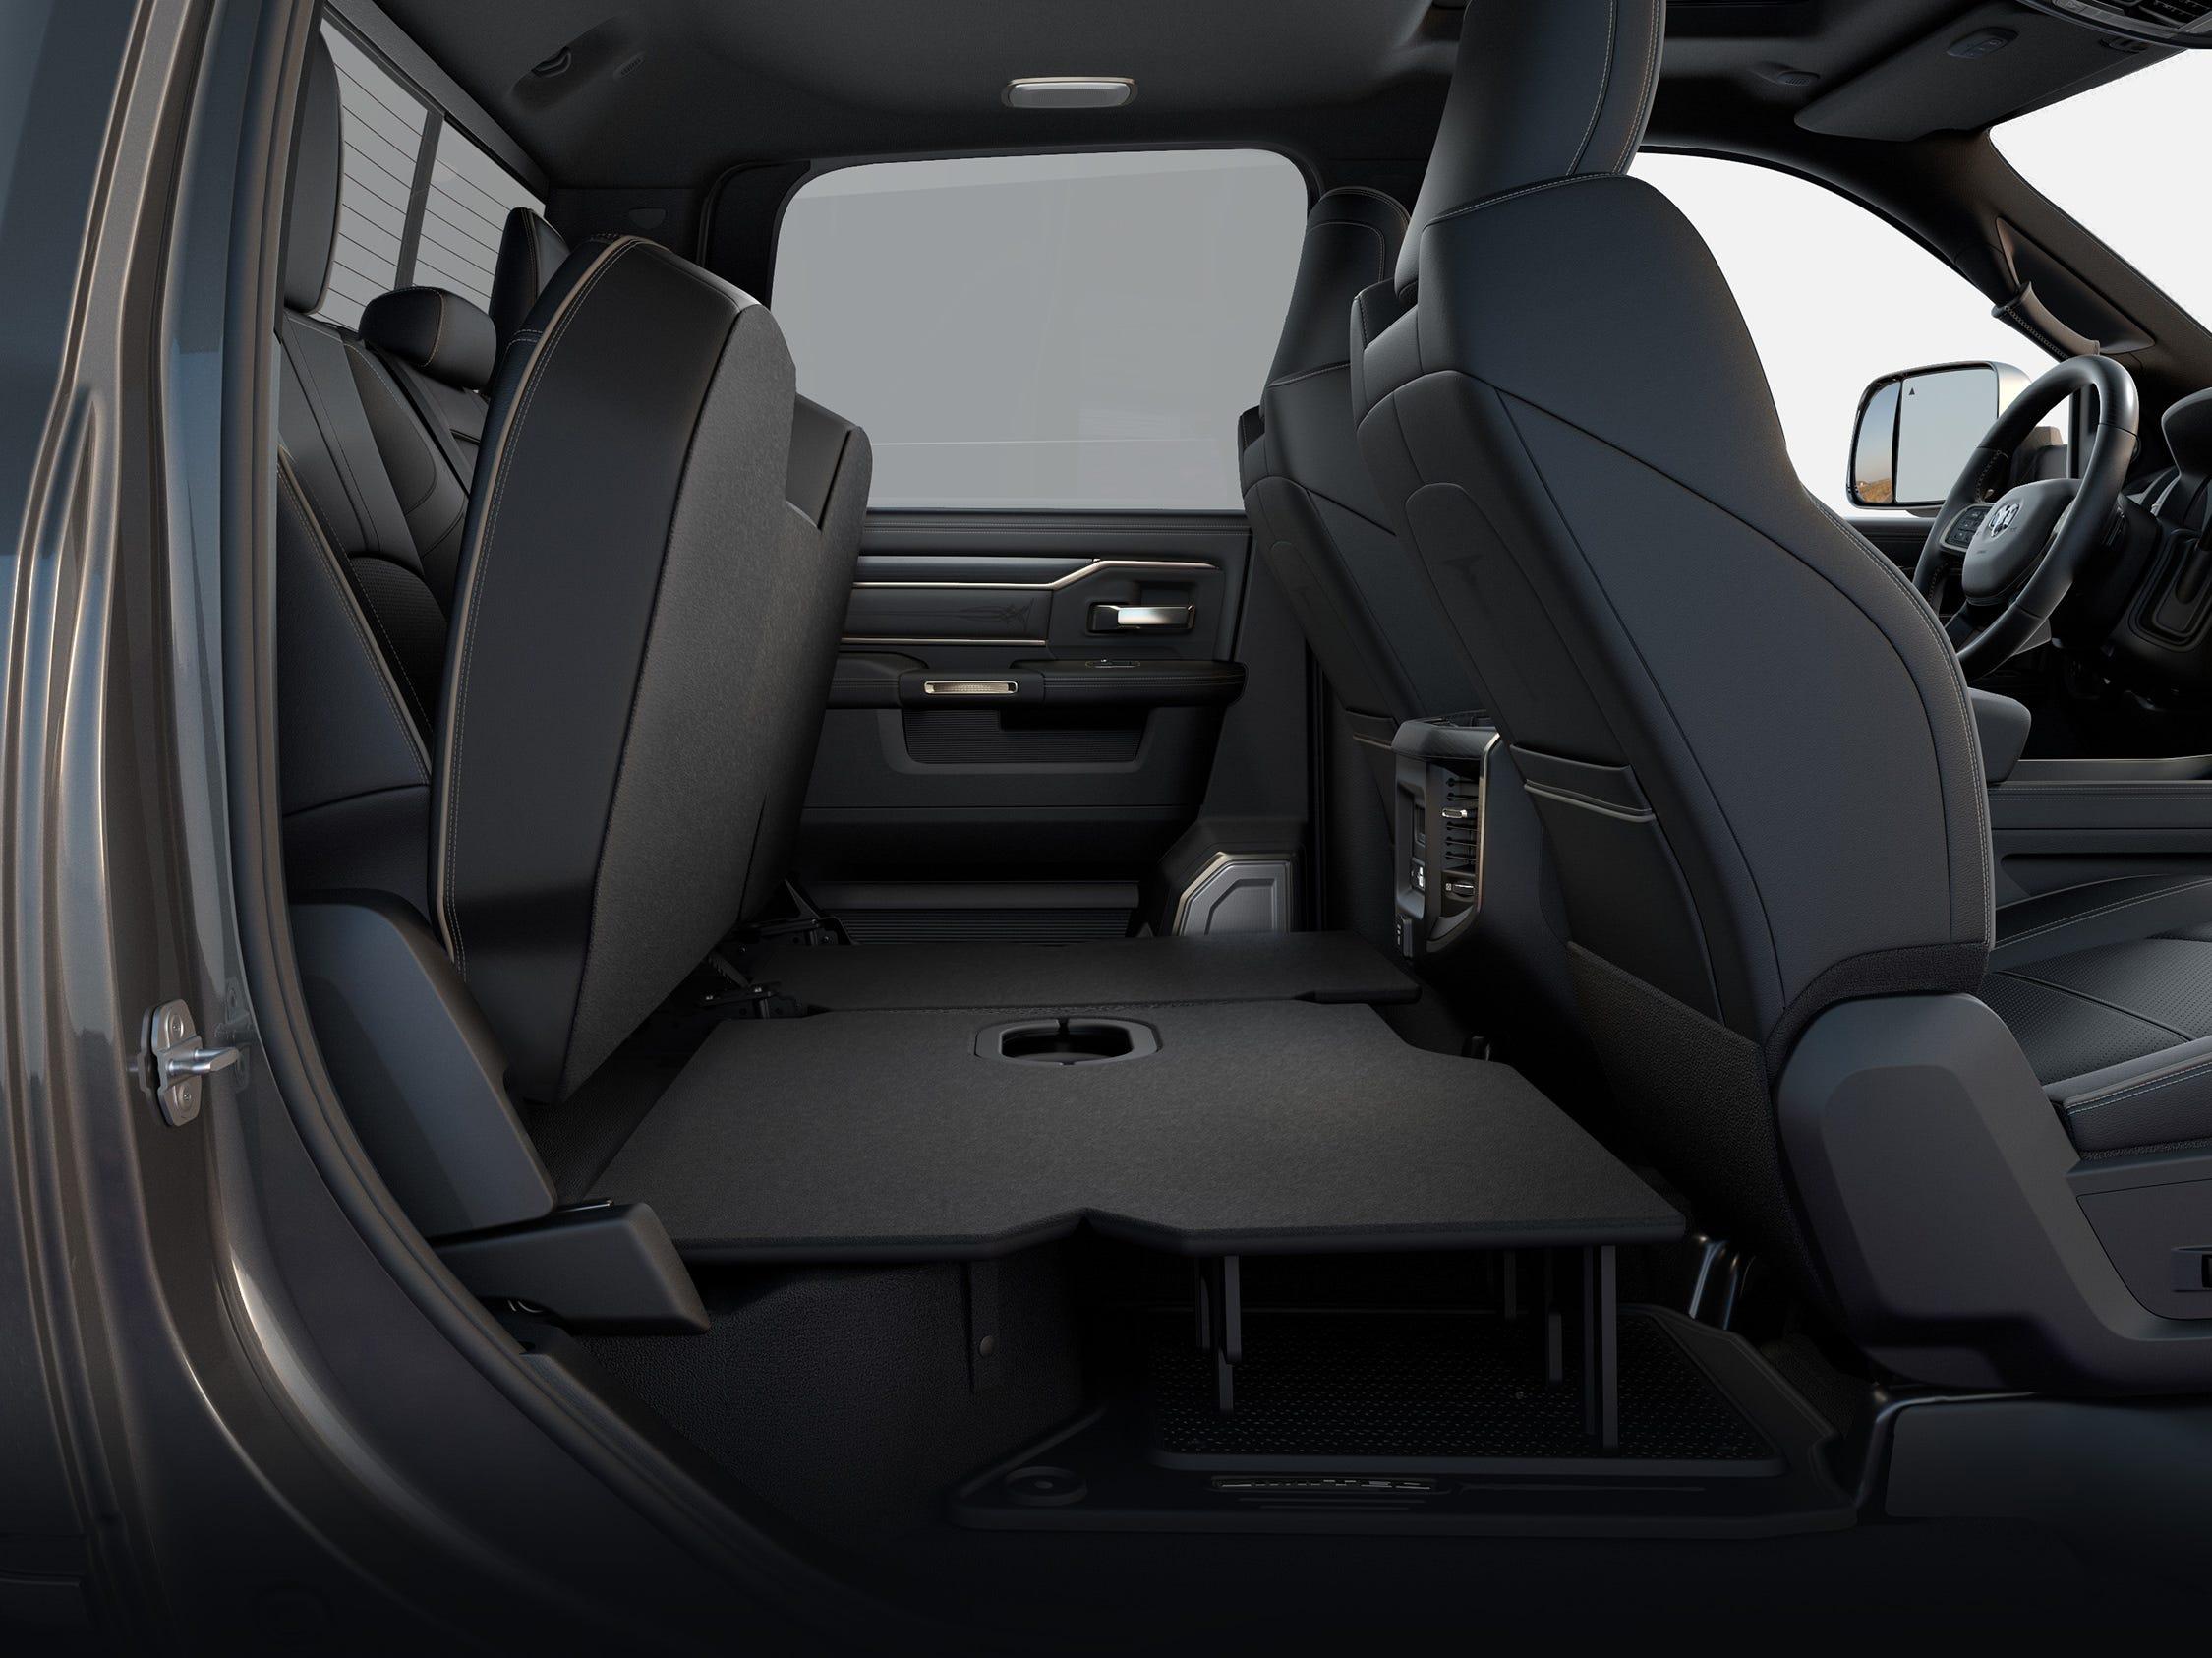 2019 Ram Heavy Duty Crew Cab rear seat profile flat-load floor